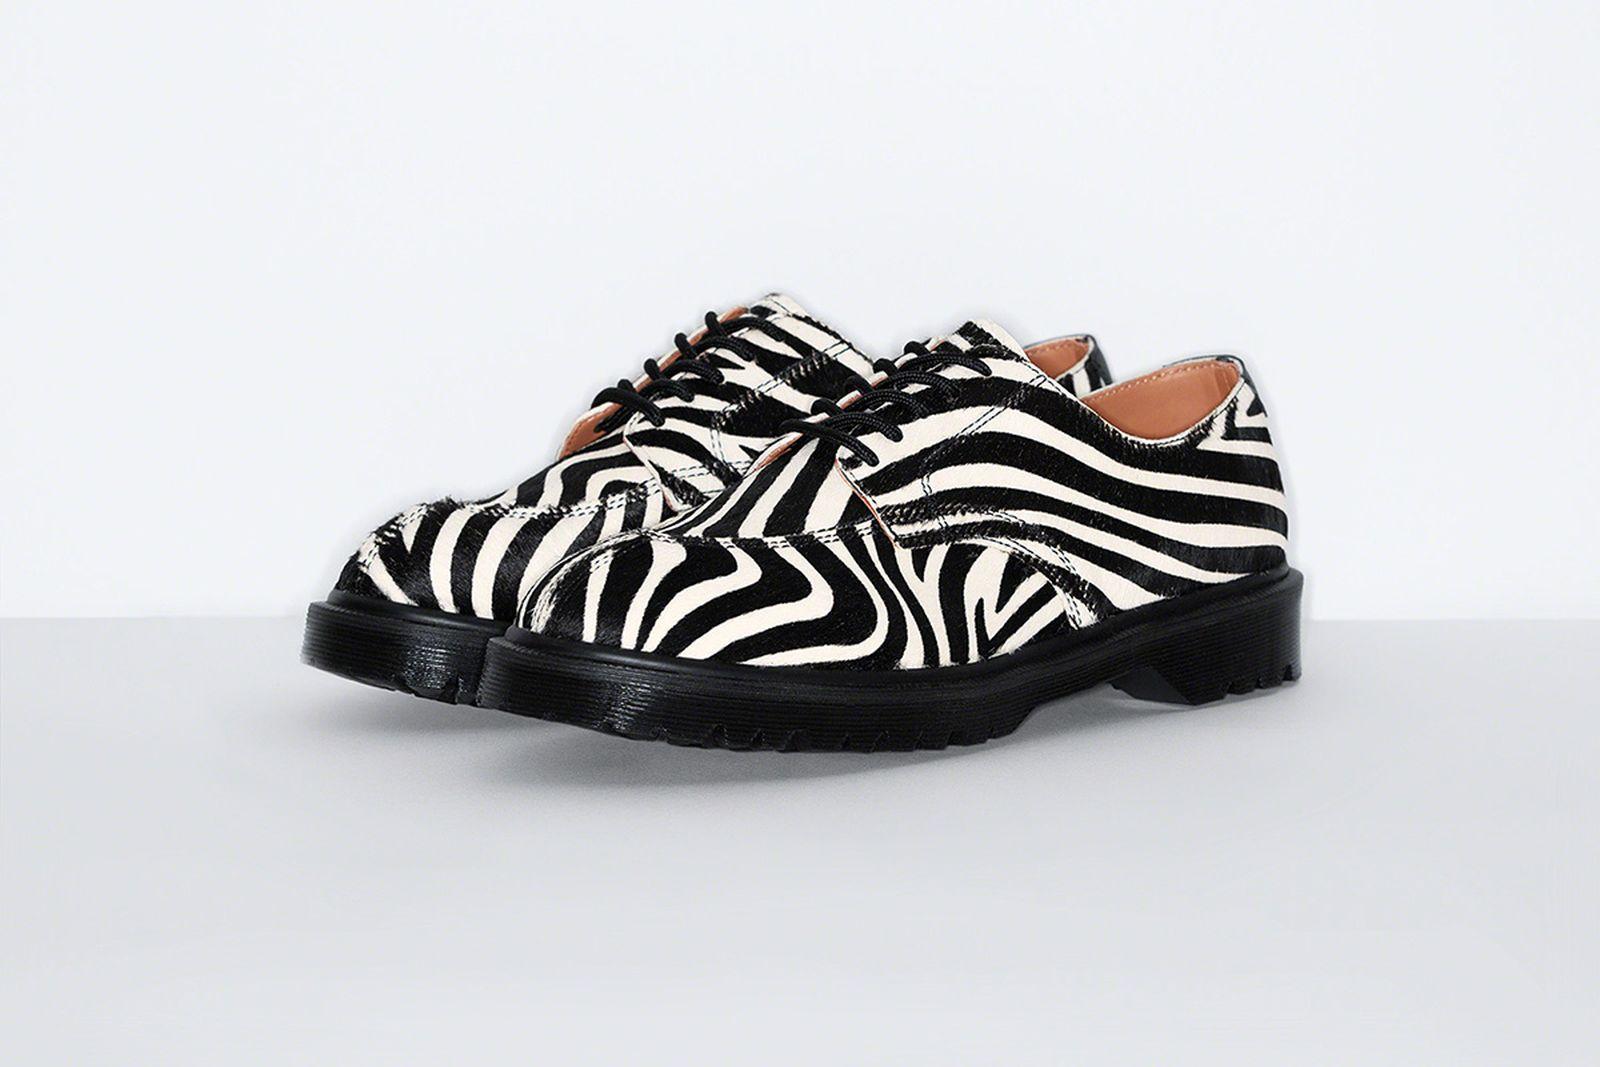 supreme-dr-martens-5-eye-shoe-release-date-price-07